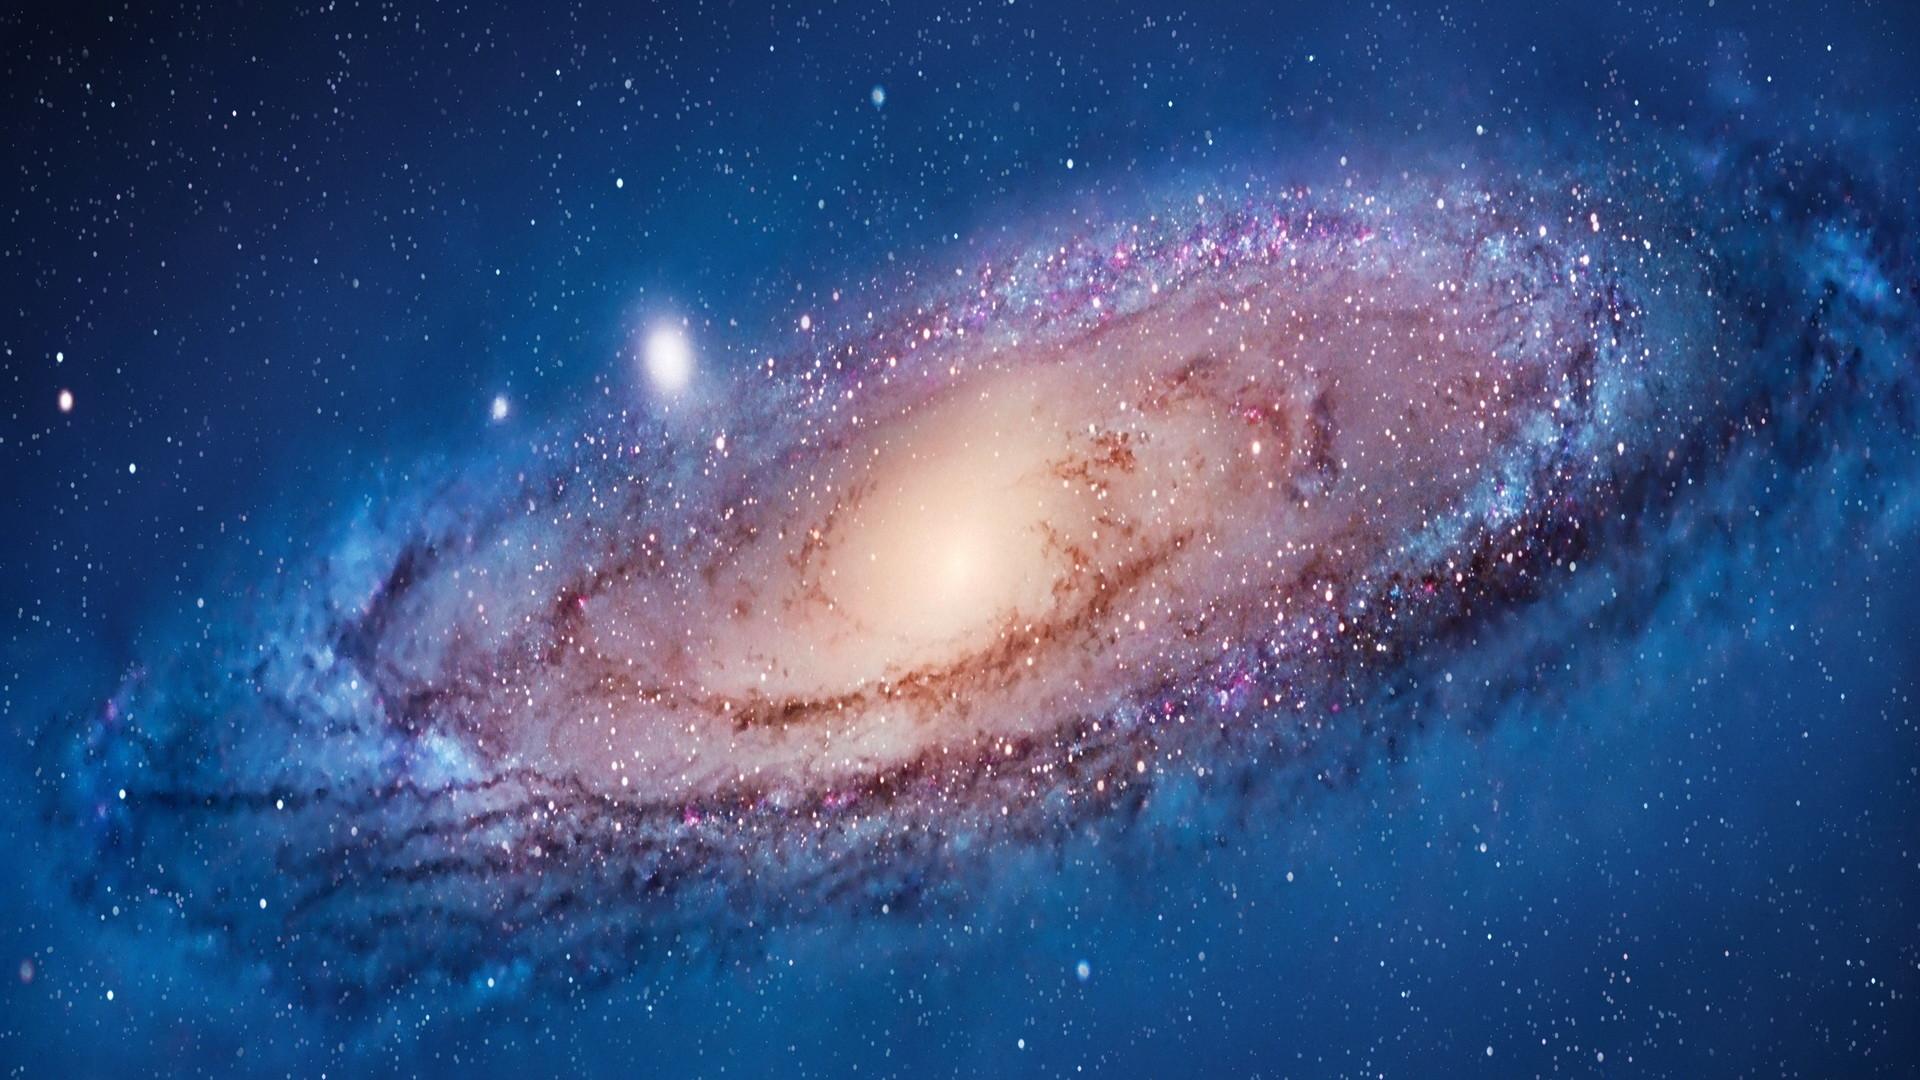 3840×2400 Wallpaper planet, light, spots, space | wallpaper 4K | Pinterest  | Planets, Wallpaper and Mac laptop